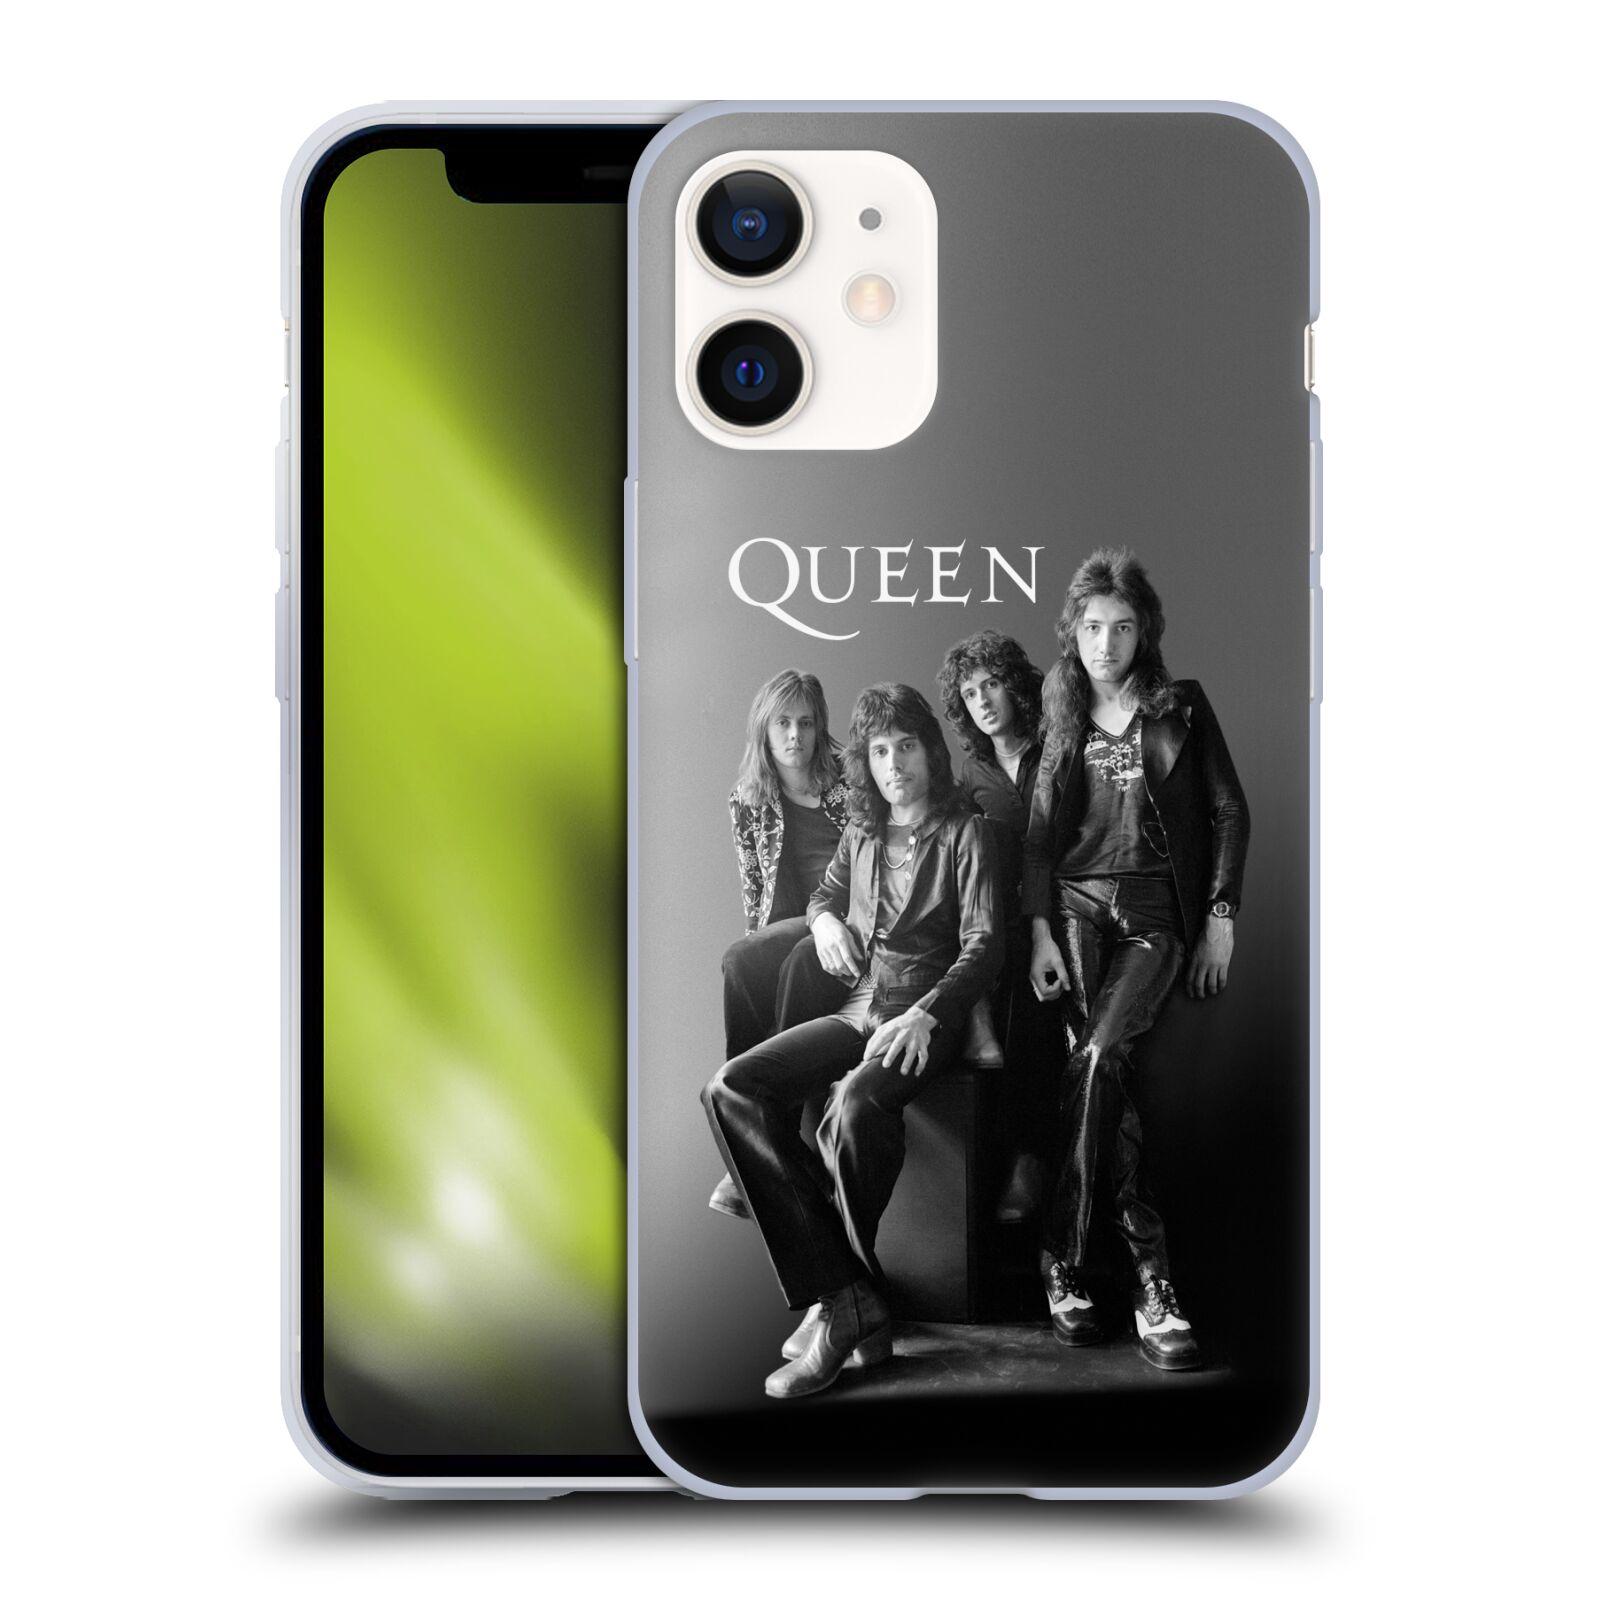 Silikonové pouzdro na mobil Apple iPhone 12 Mini - Head Case - Queen - Skupina